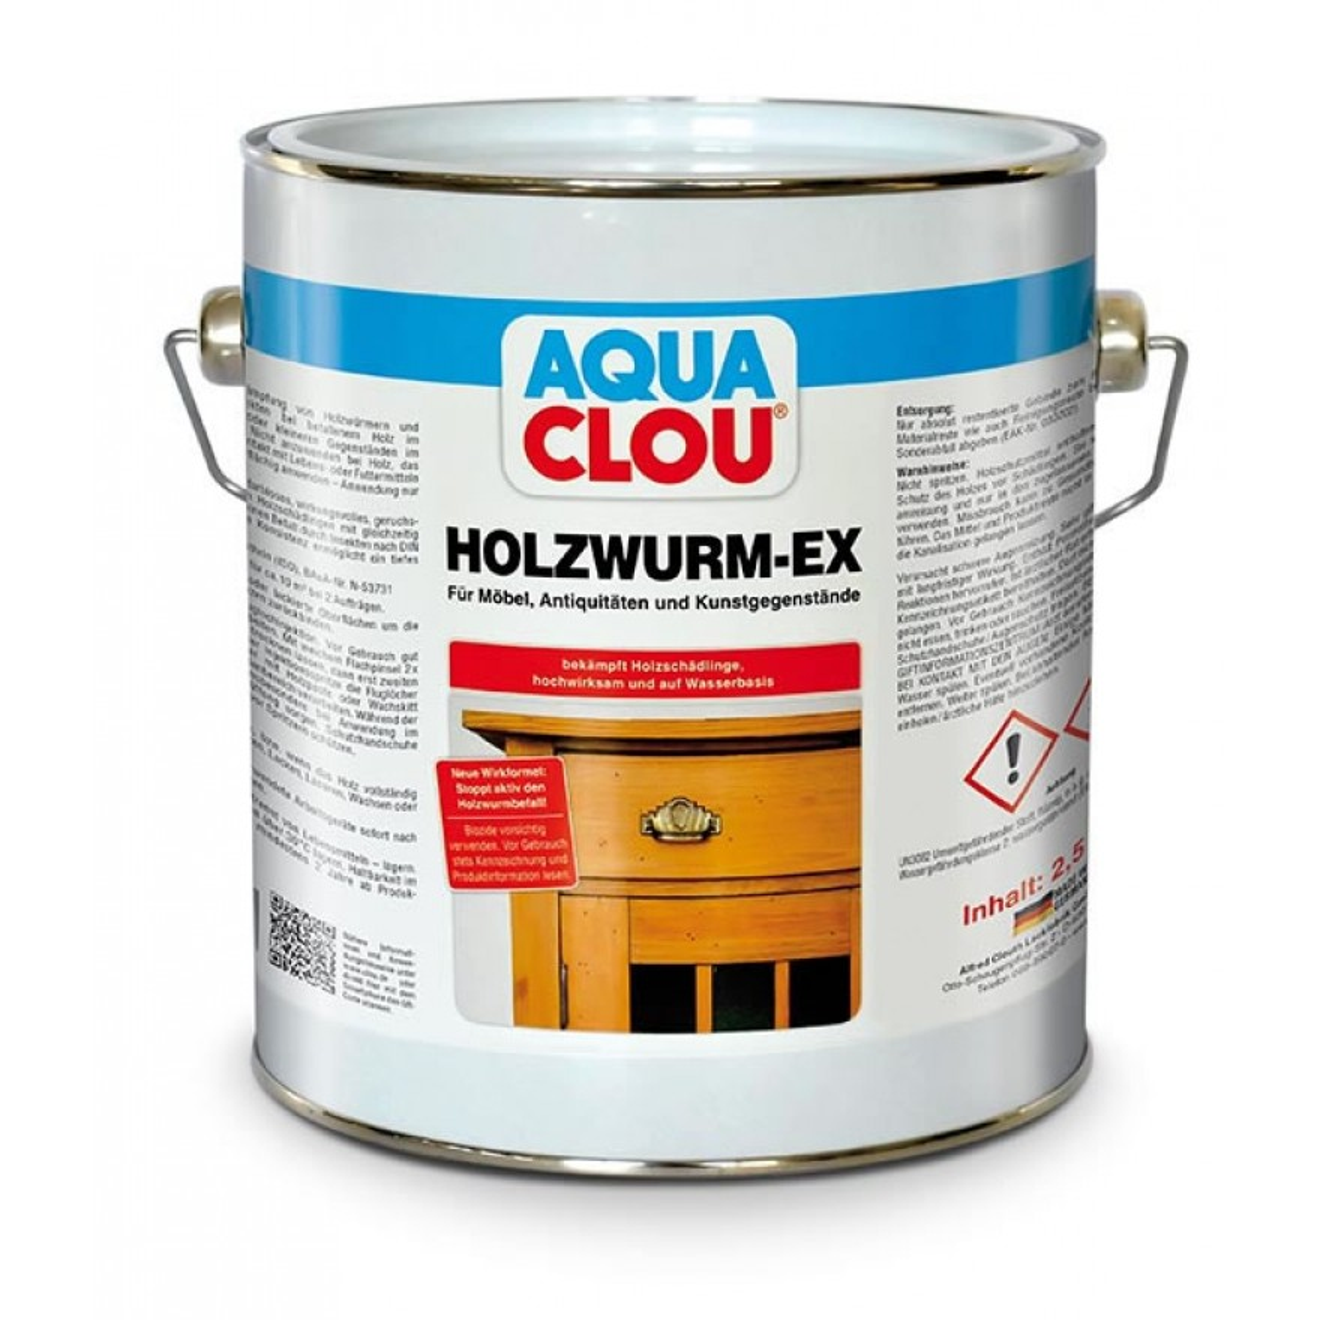 aqua clou holzwurm ex holzzerst rende insektenlarven wie holzwurm hausbock. Black Bedroom Furniture Sets. Home Design Ideas